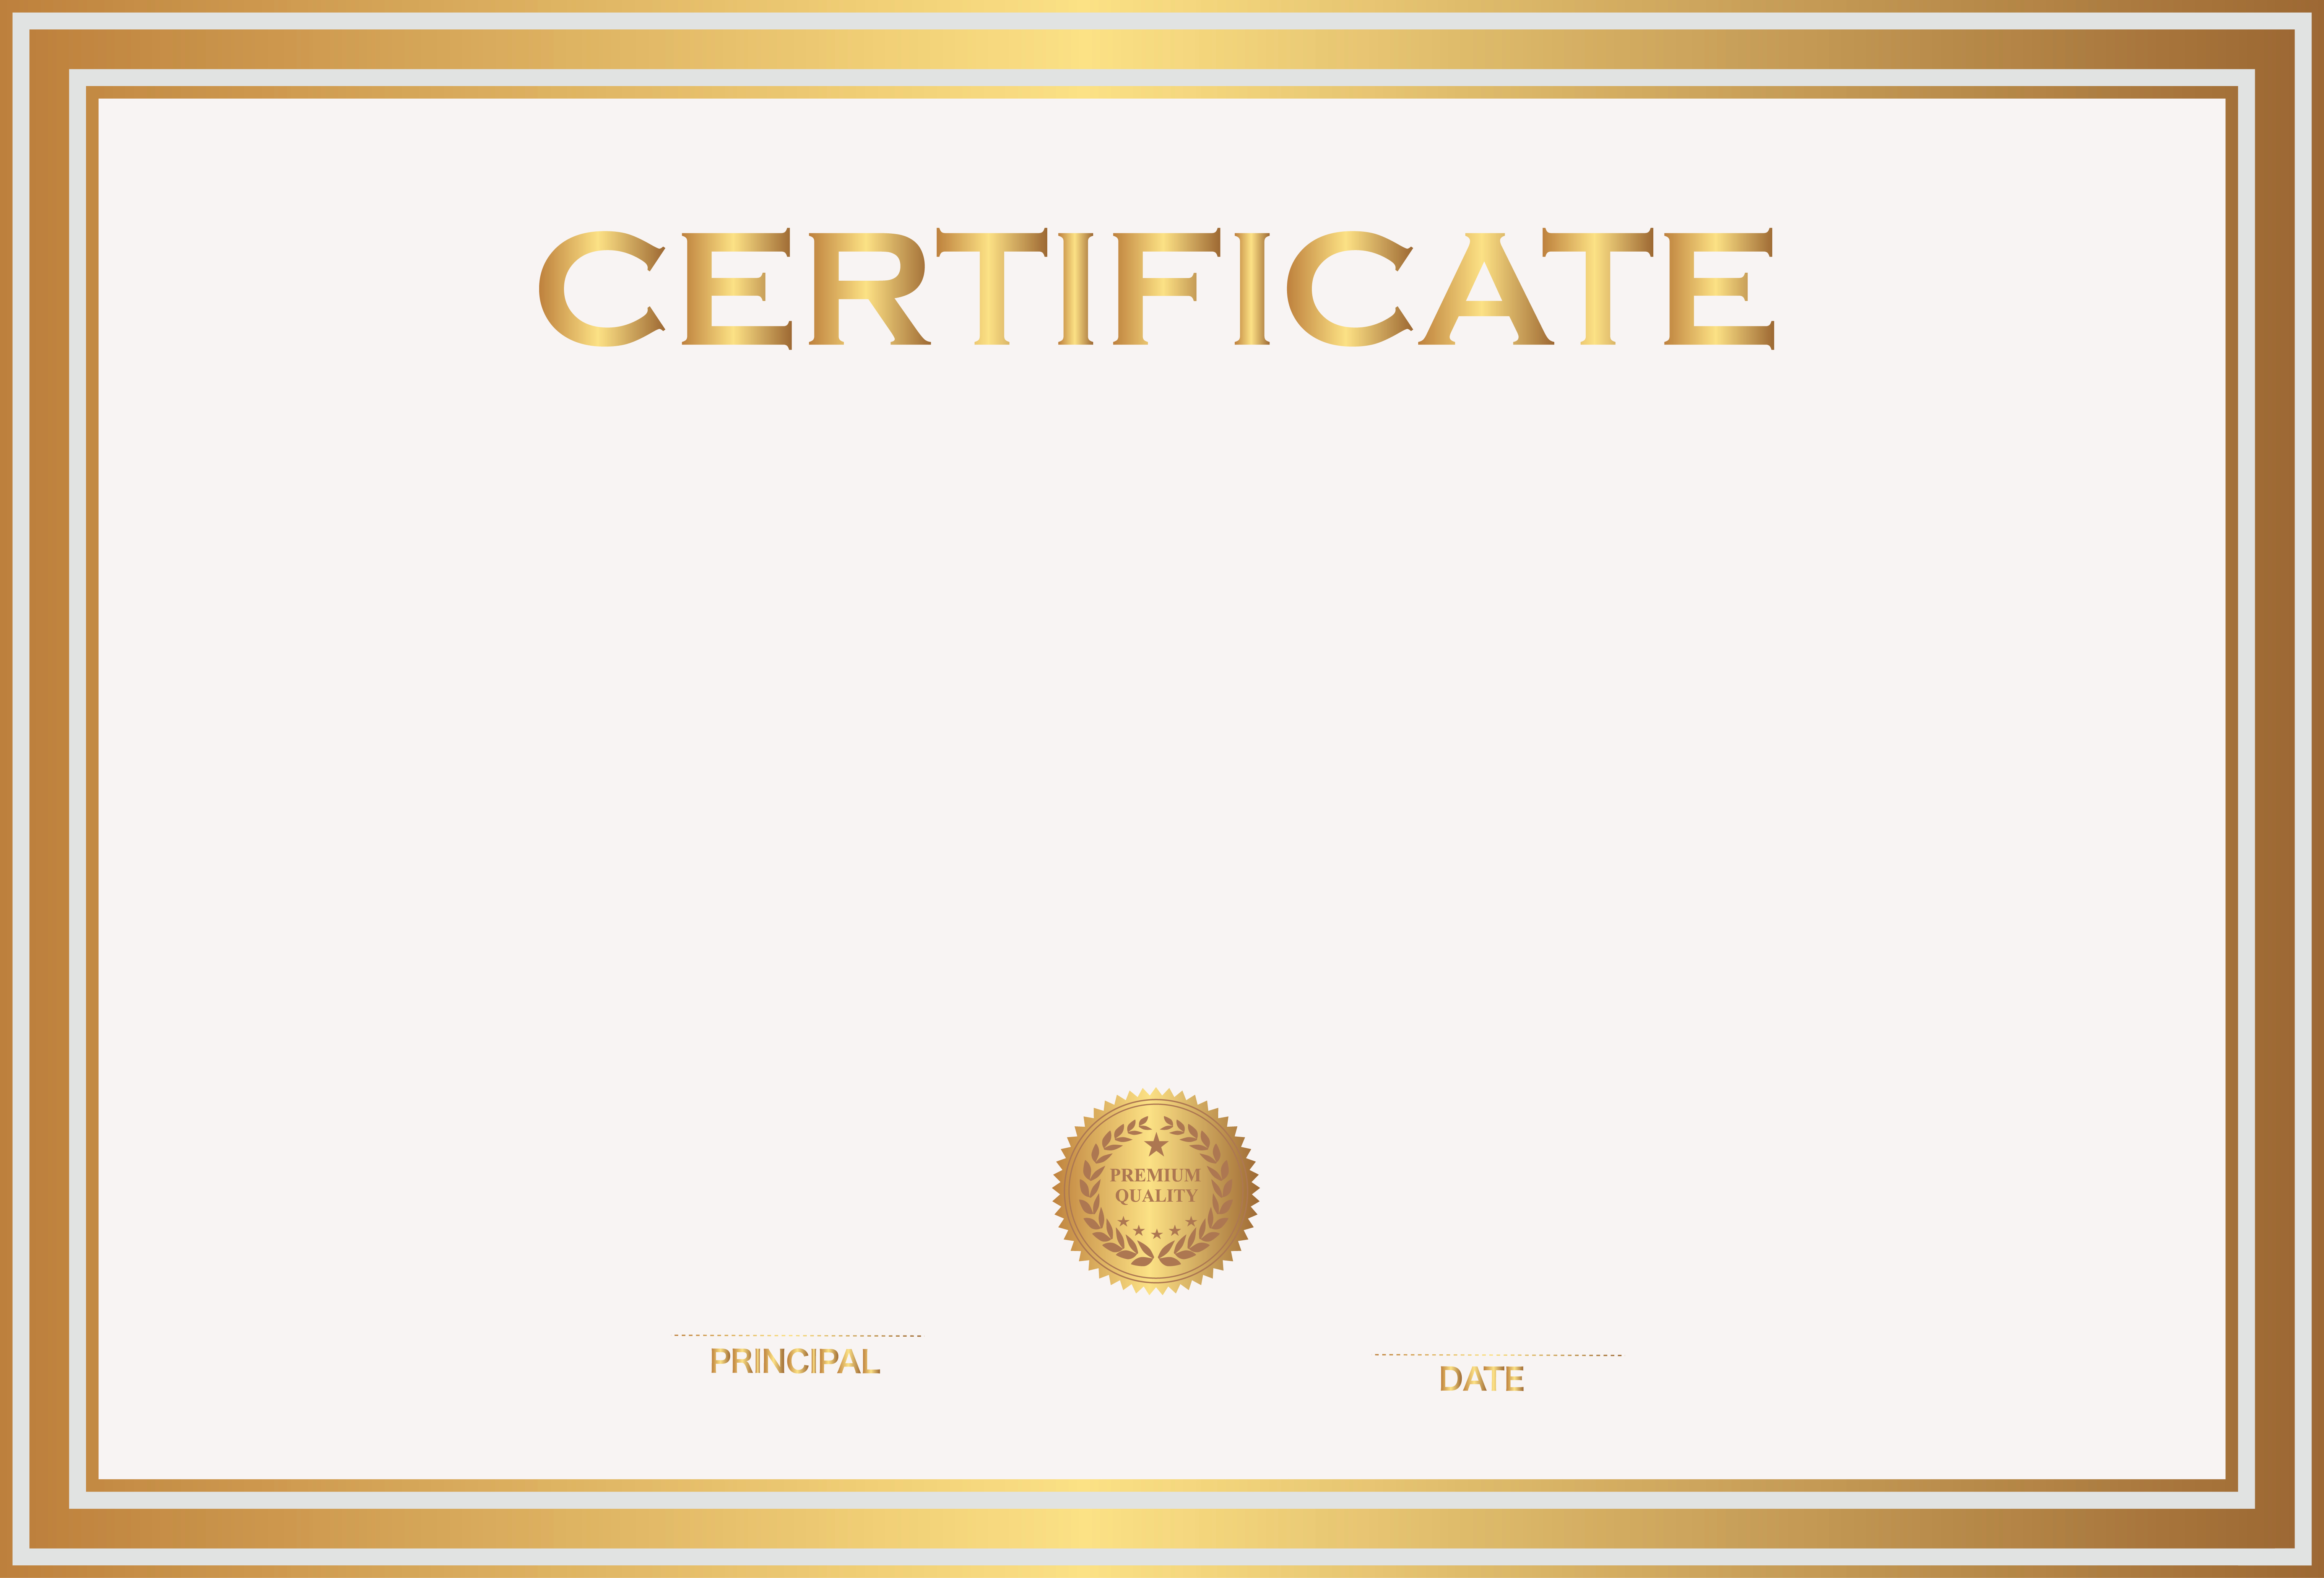 Certificate Template Png Transparent Certificate Template